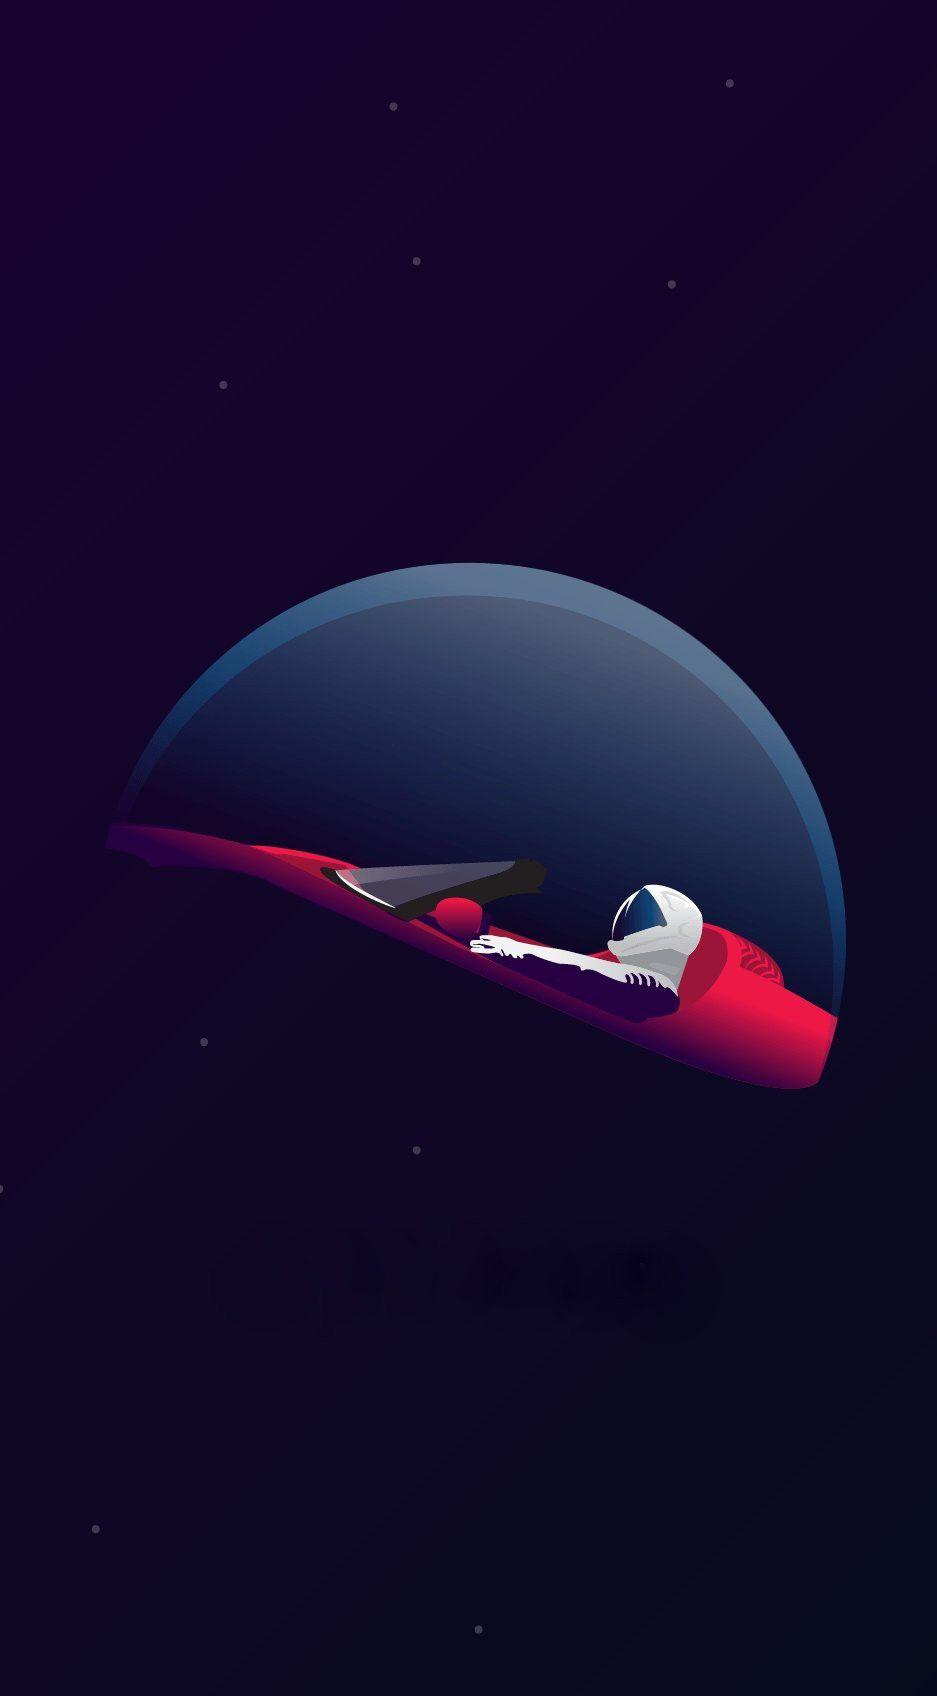 tesla spacex in 2019 Technology wallpaper Wallpaper Apple 937x1696